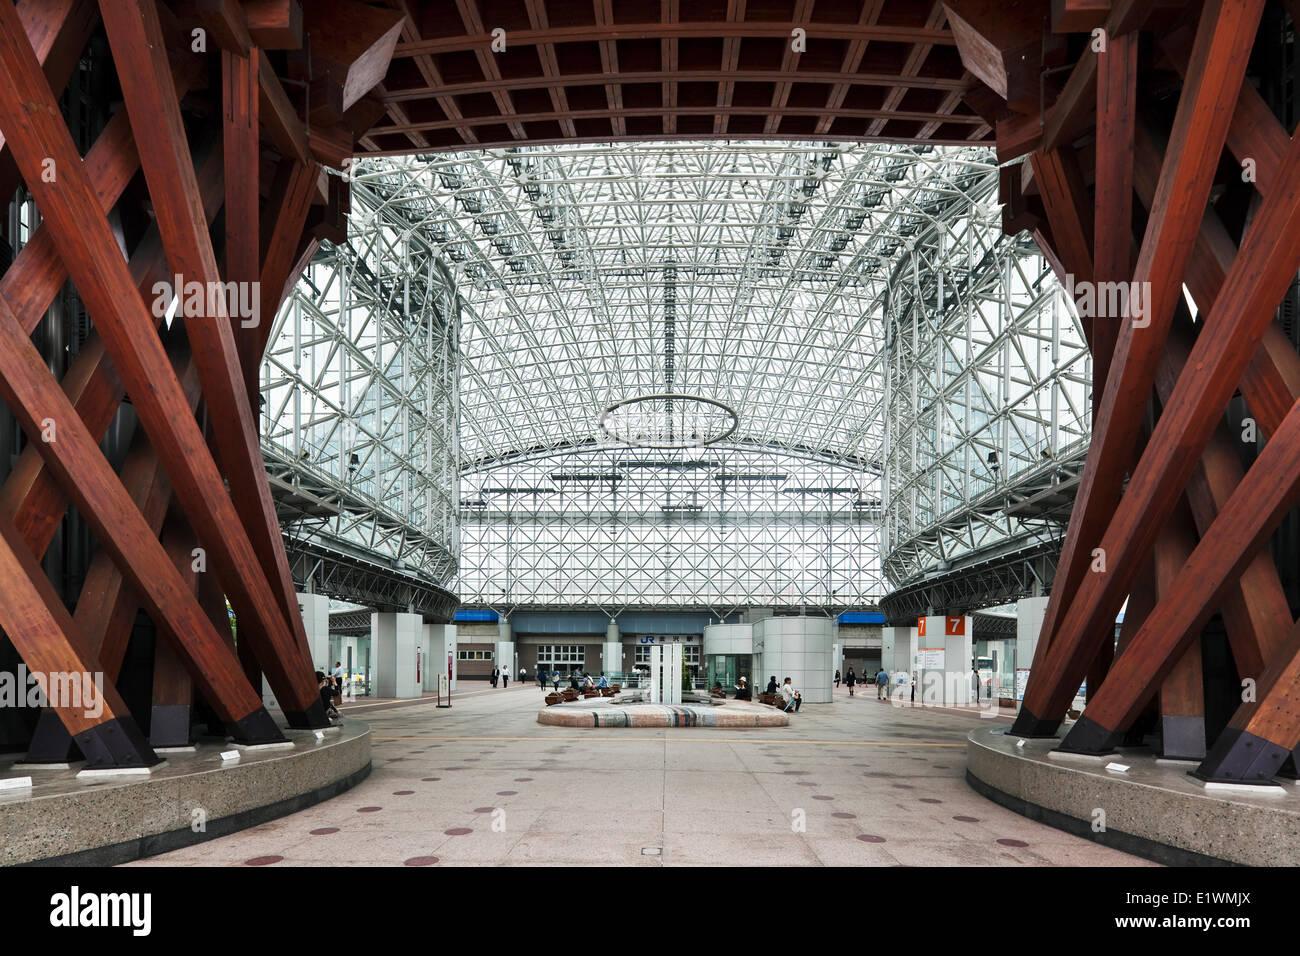 Kanazawa Station is a futuristic glass and steel train station on West Japan Railway's Hokuriku Line. - Stock Image